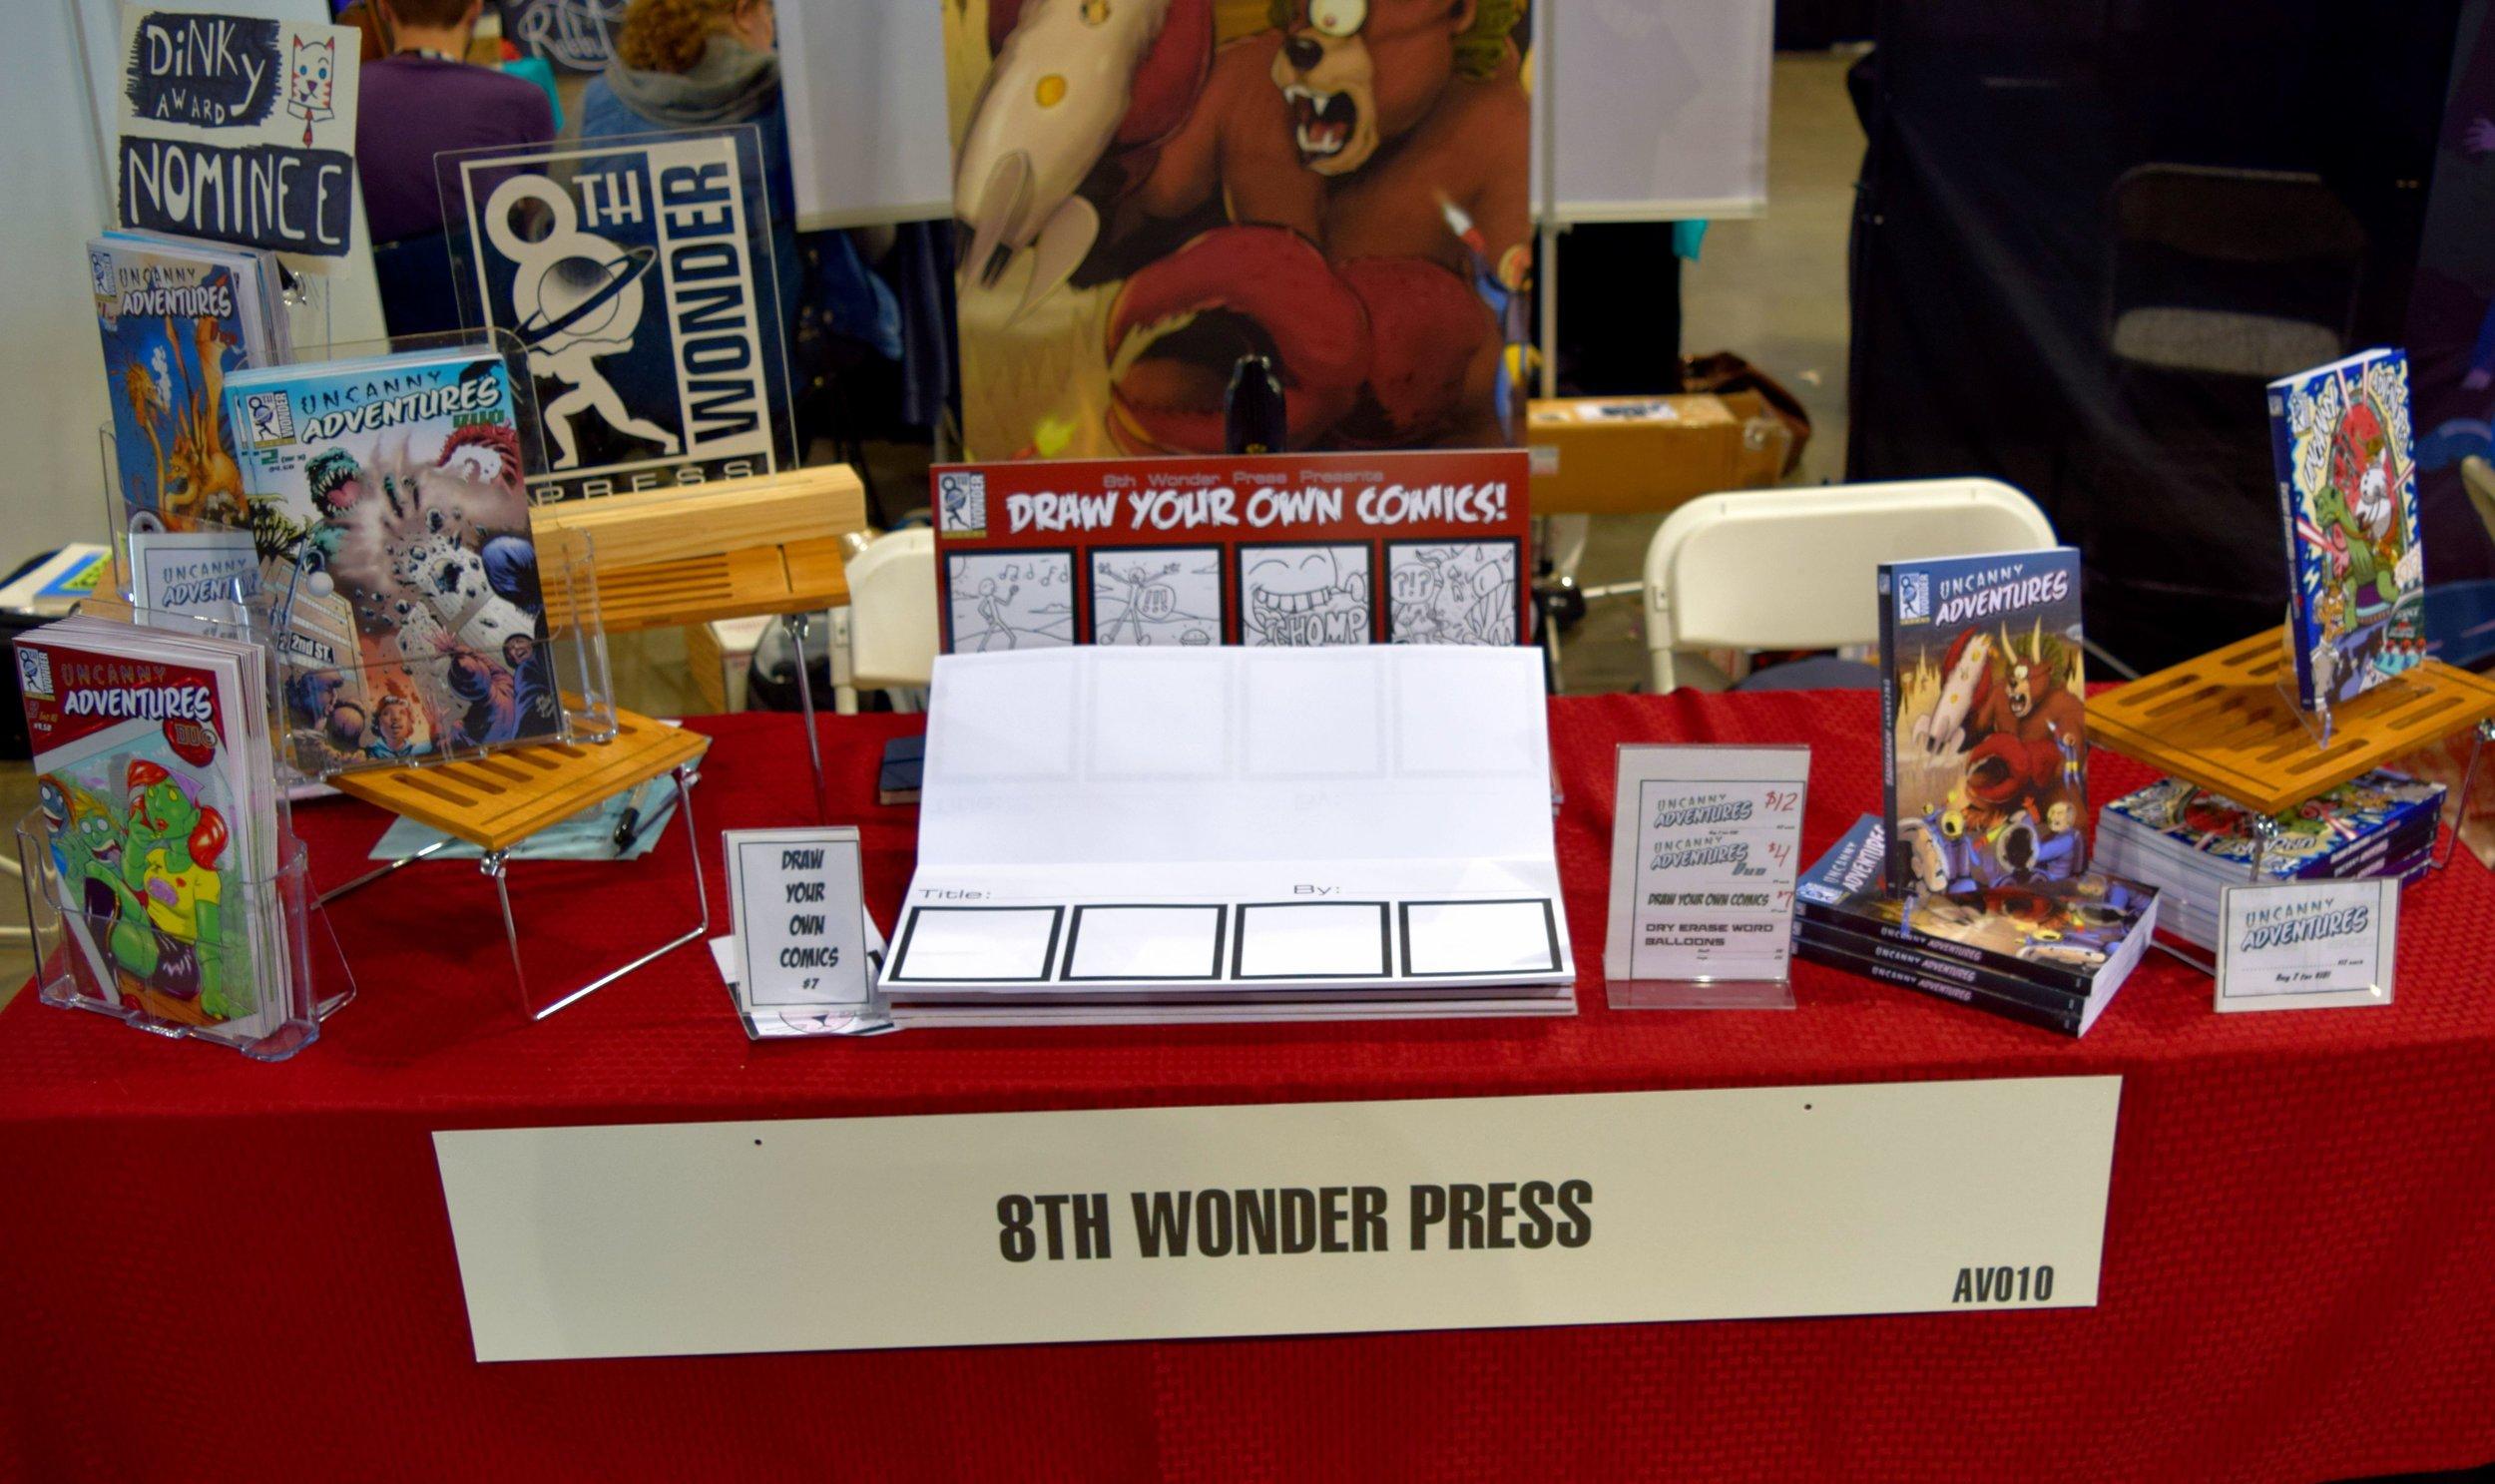 8th Wonder Press table at Denver Comic Con 2016.